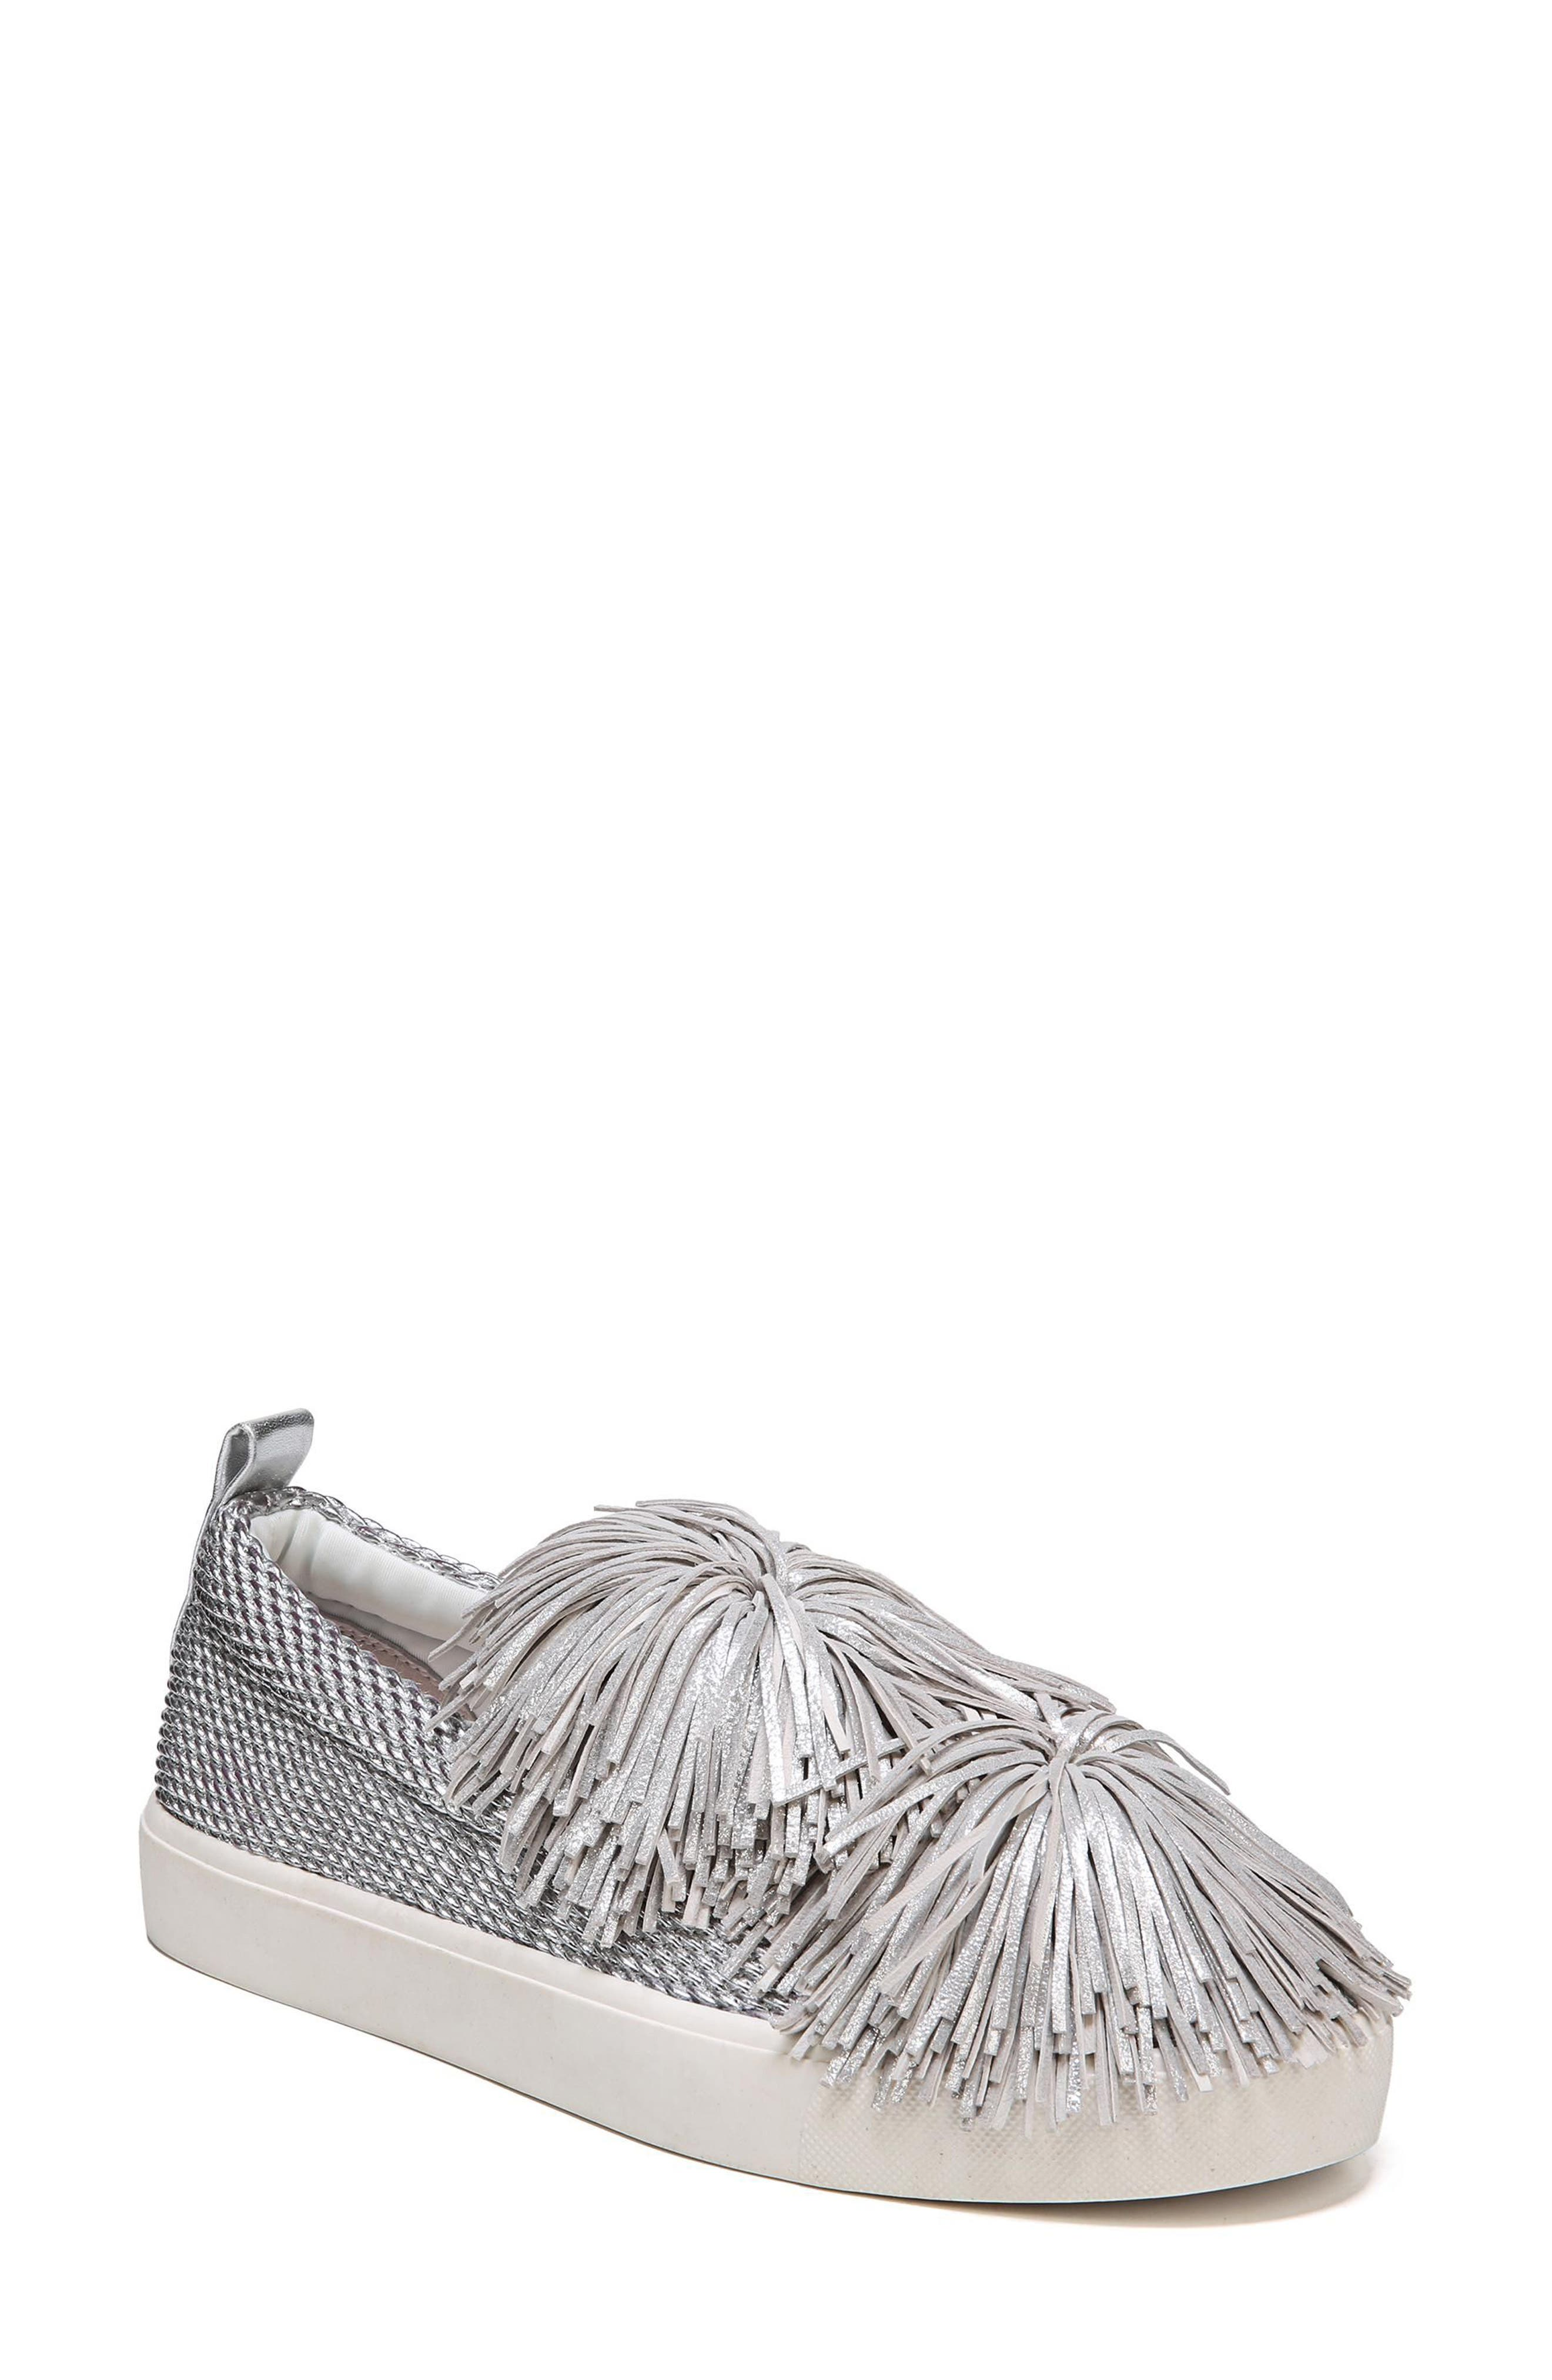 Emory Fringe Pompom Sneaker,                             Main thumbnail 1, color,                             Metallic Silver